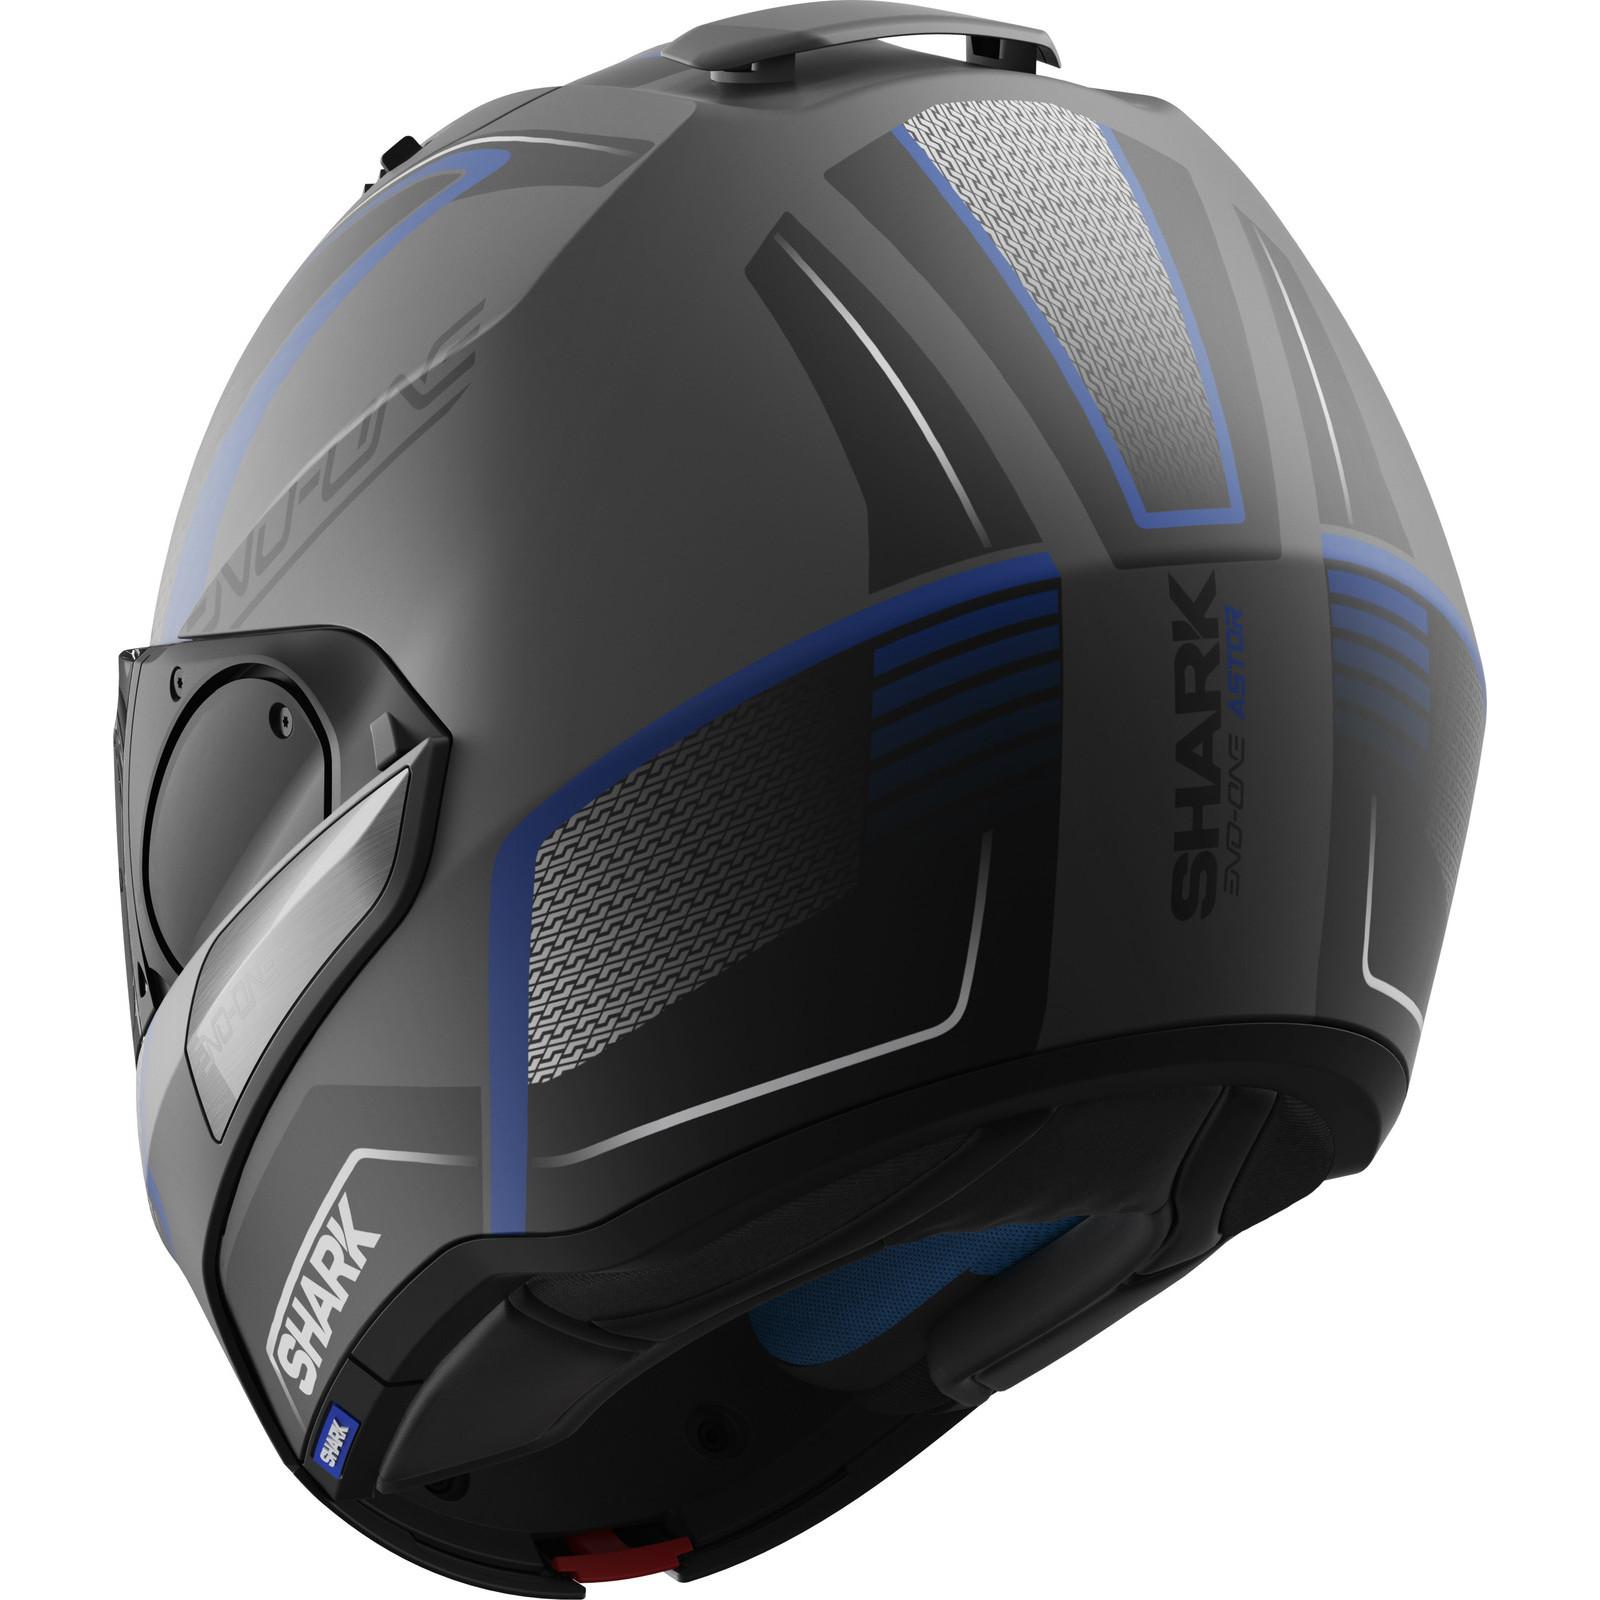 shark evo one astor flip front motorcycle helmet flip up internal sun visor ece ebay. Black Bedroom Furniture Sets. Home Design Ideas